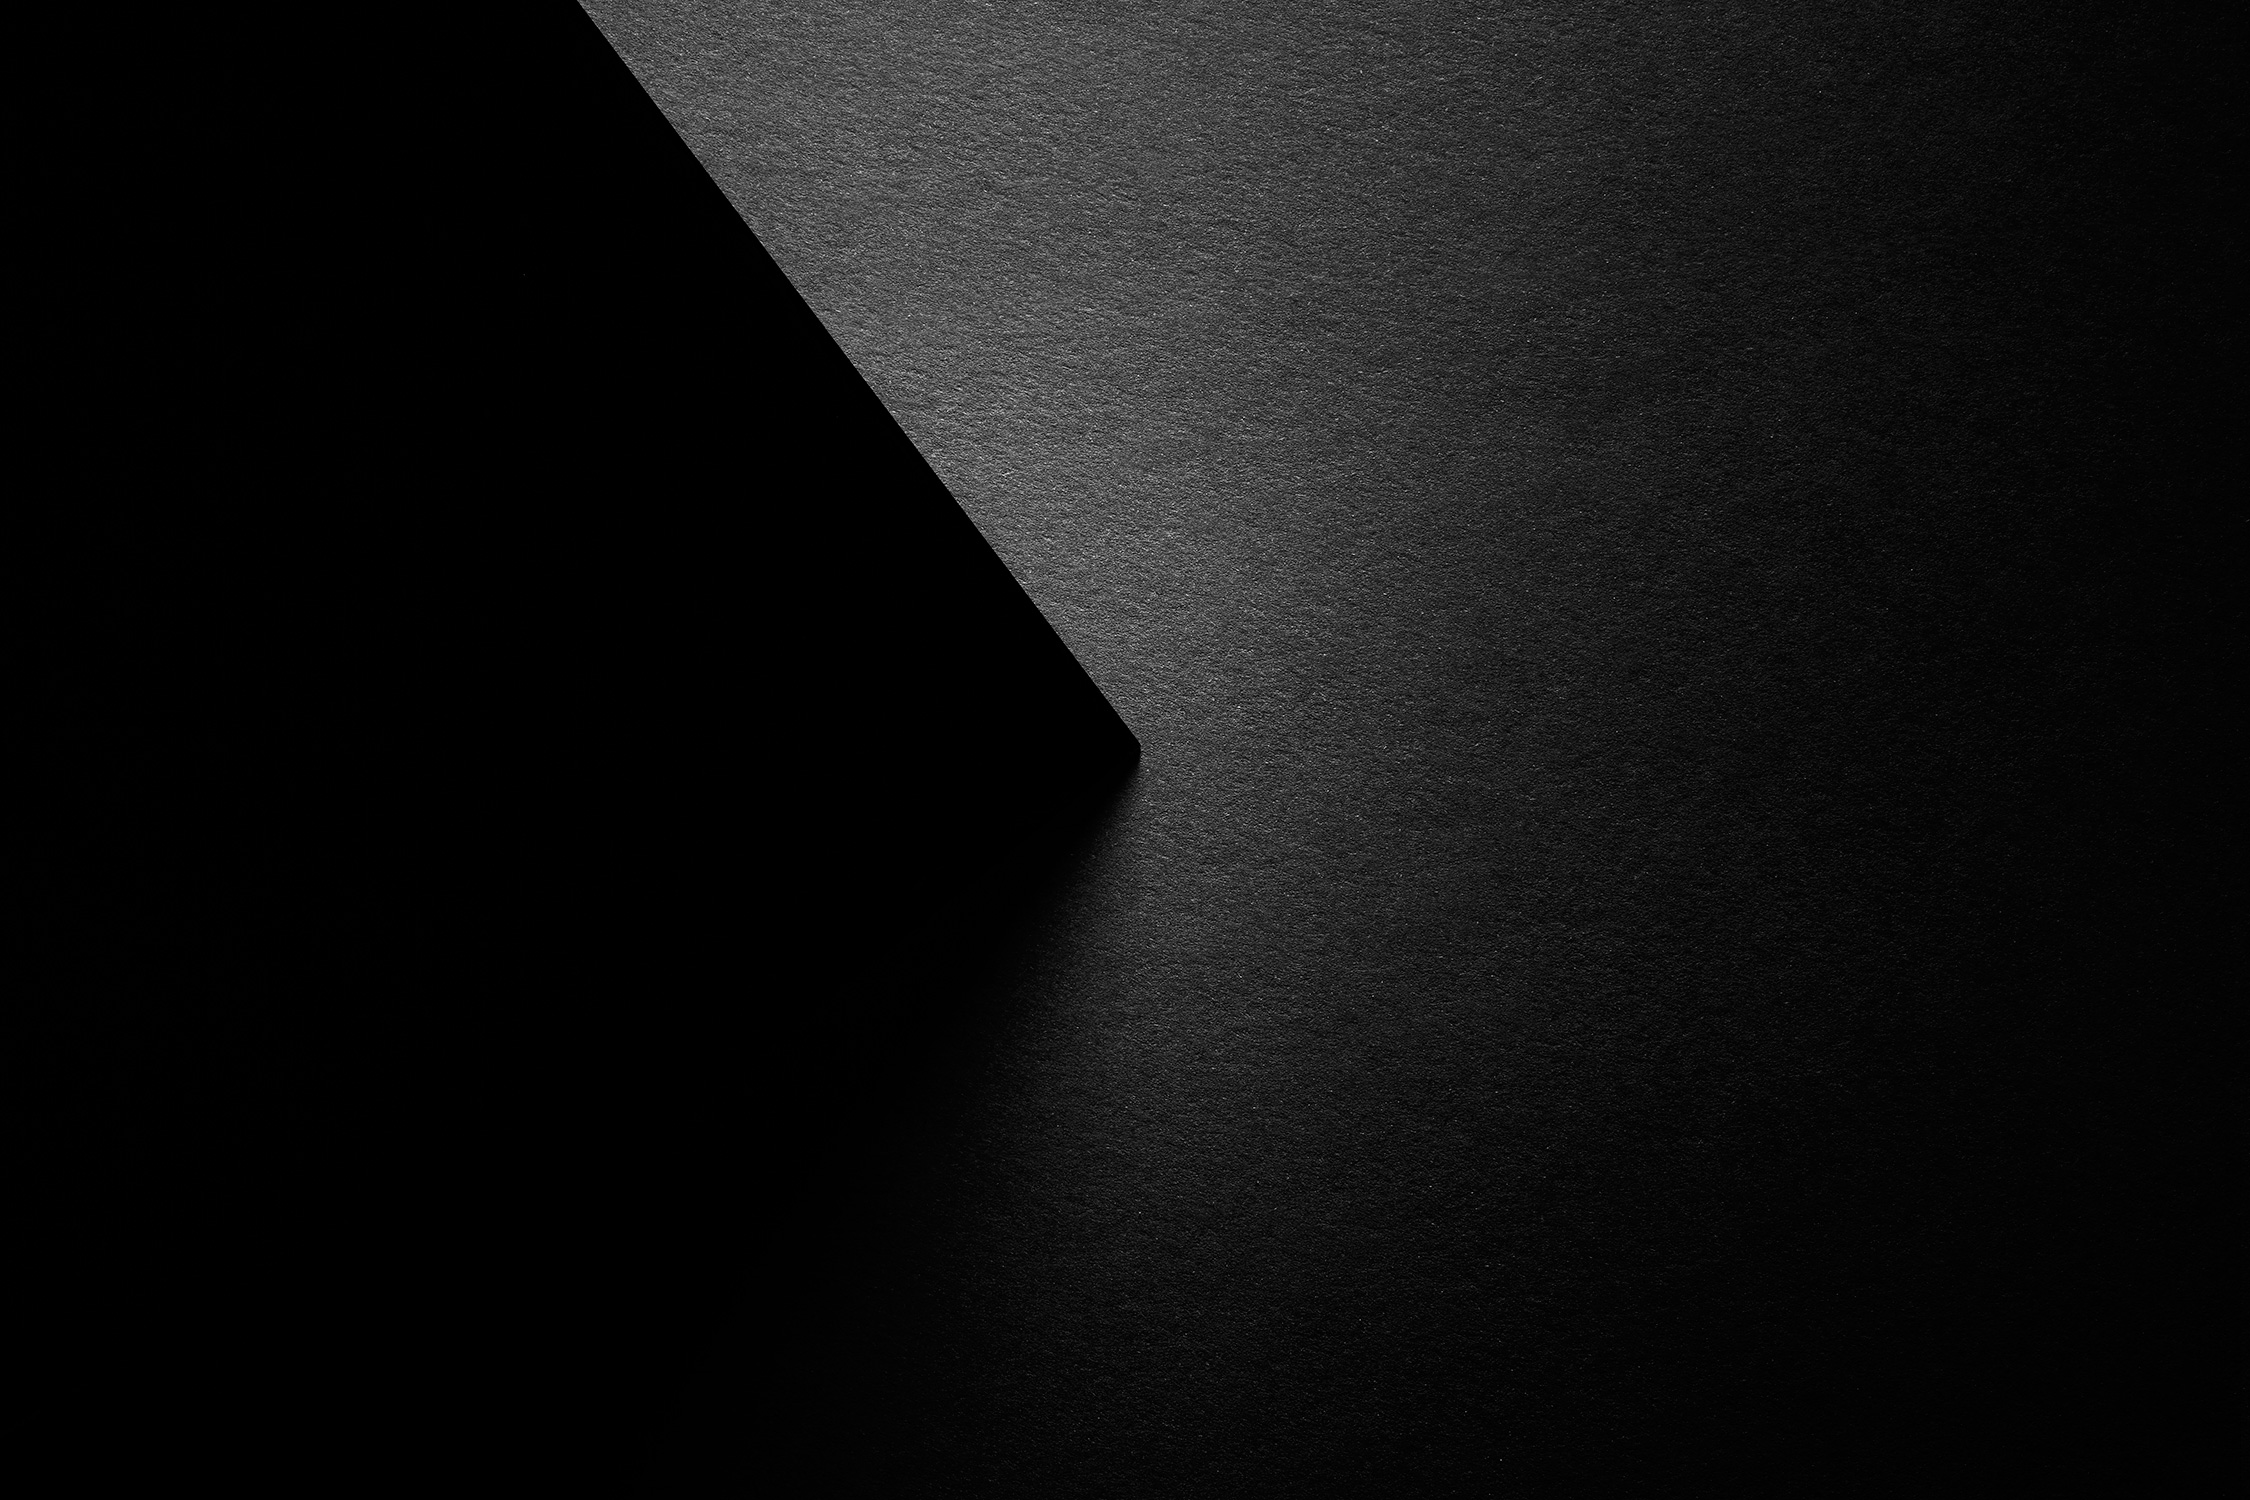 20150506_Black_White_card_0282_FRONT_Whole_Stitch_V1.jpg